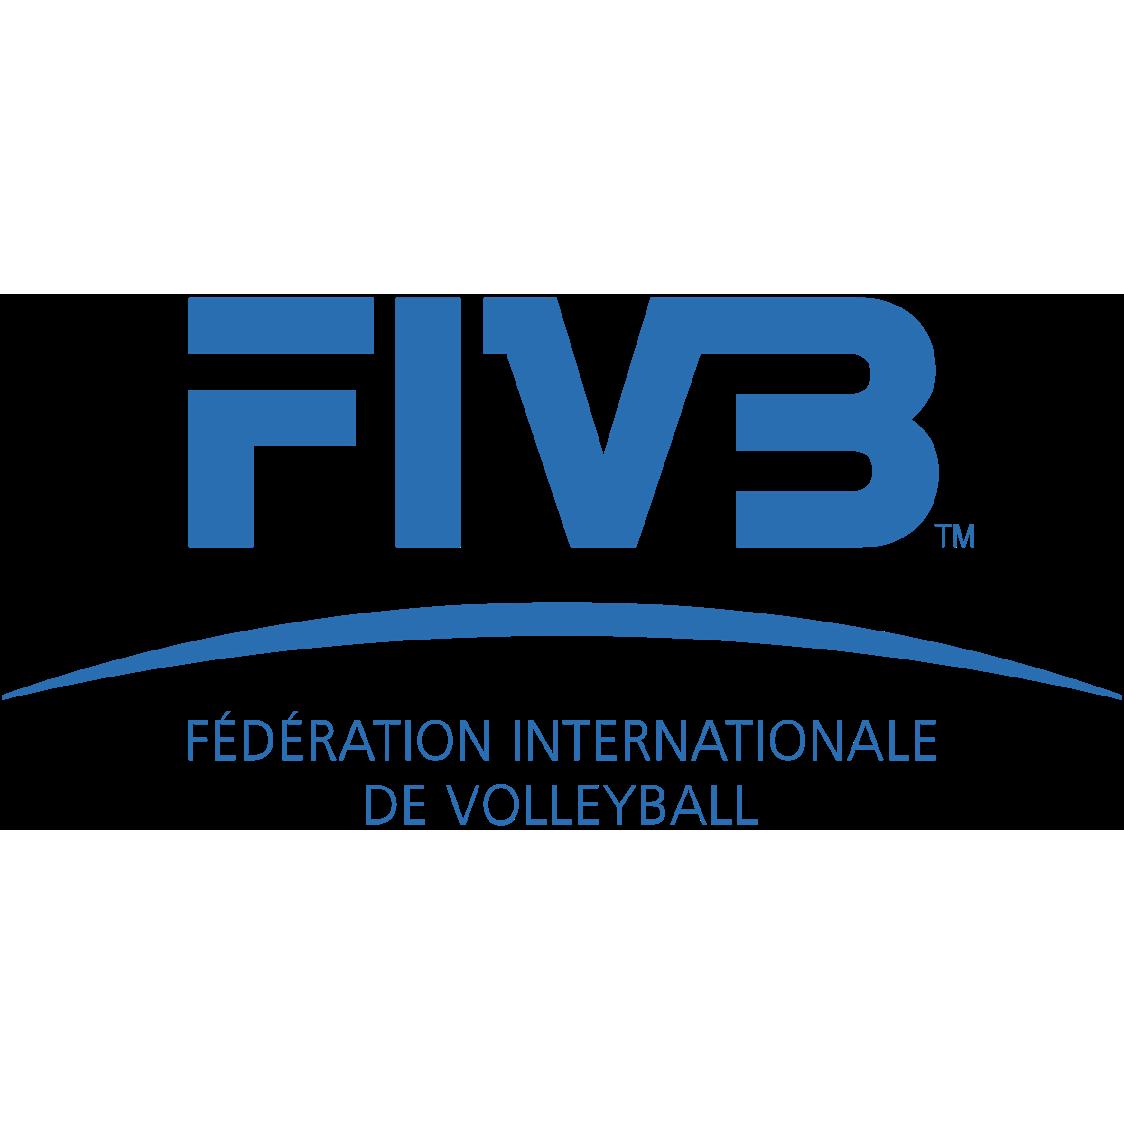 2014 FIVB Volleyball Men's Club World Championship